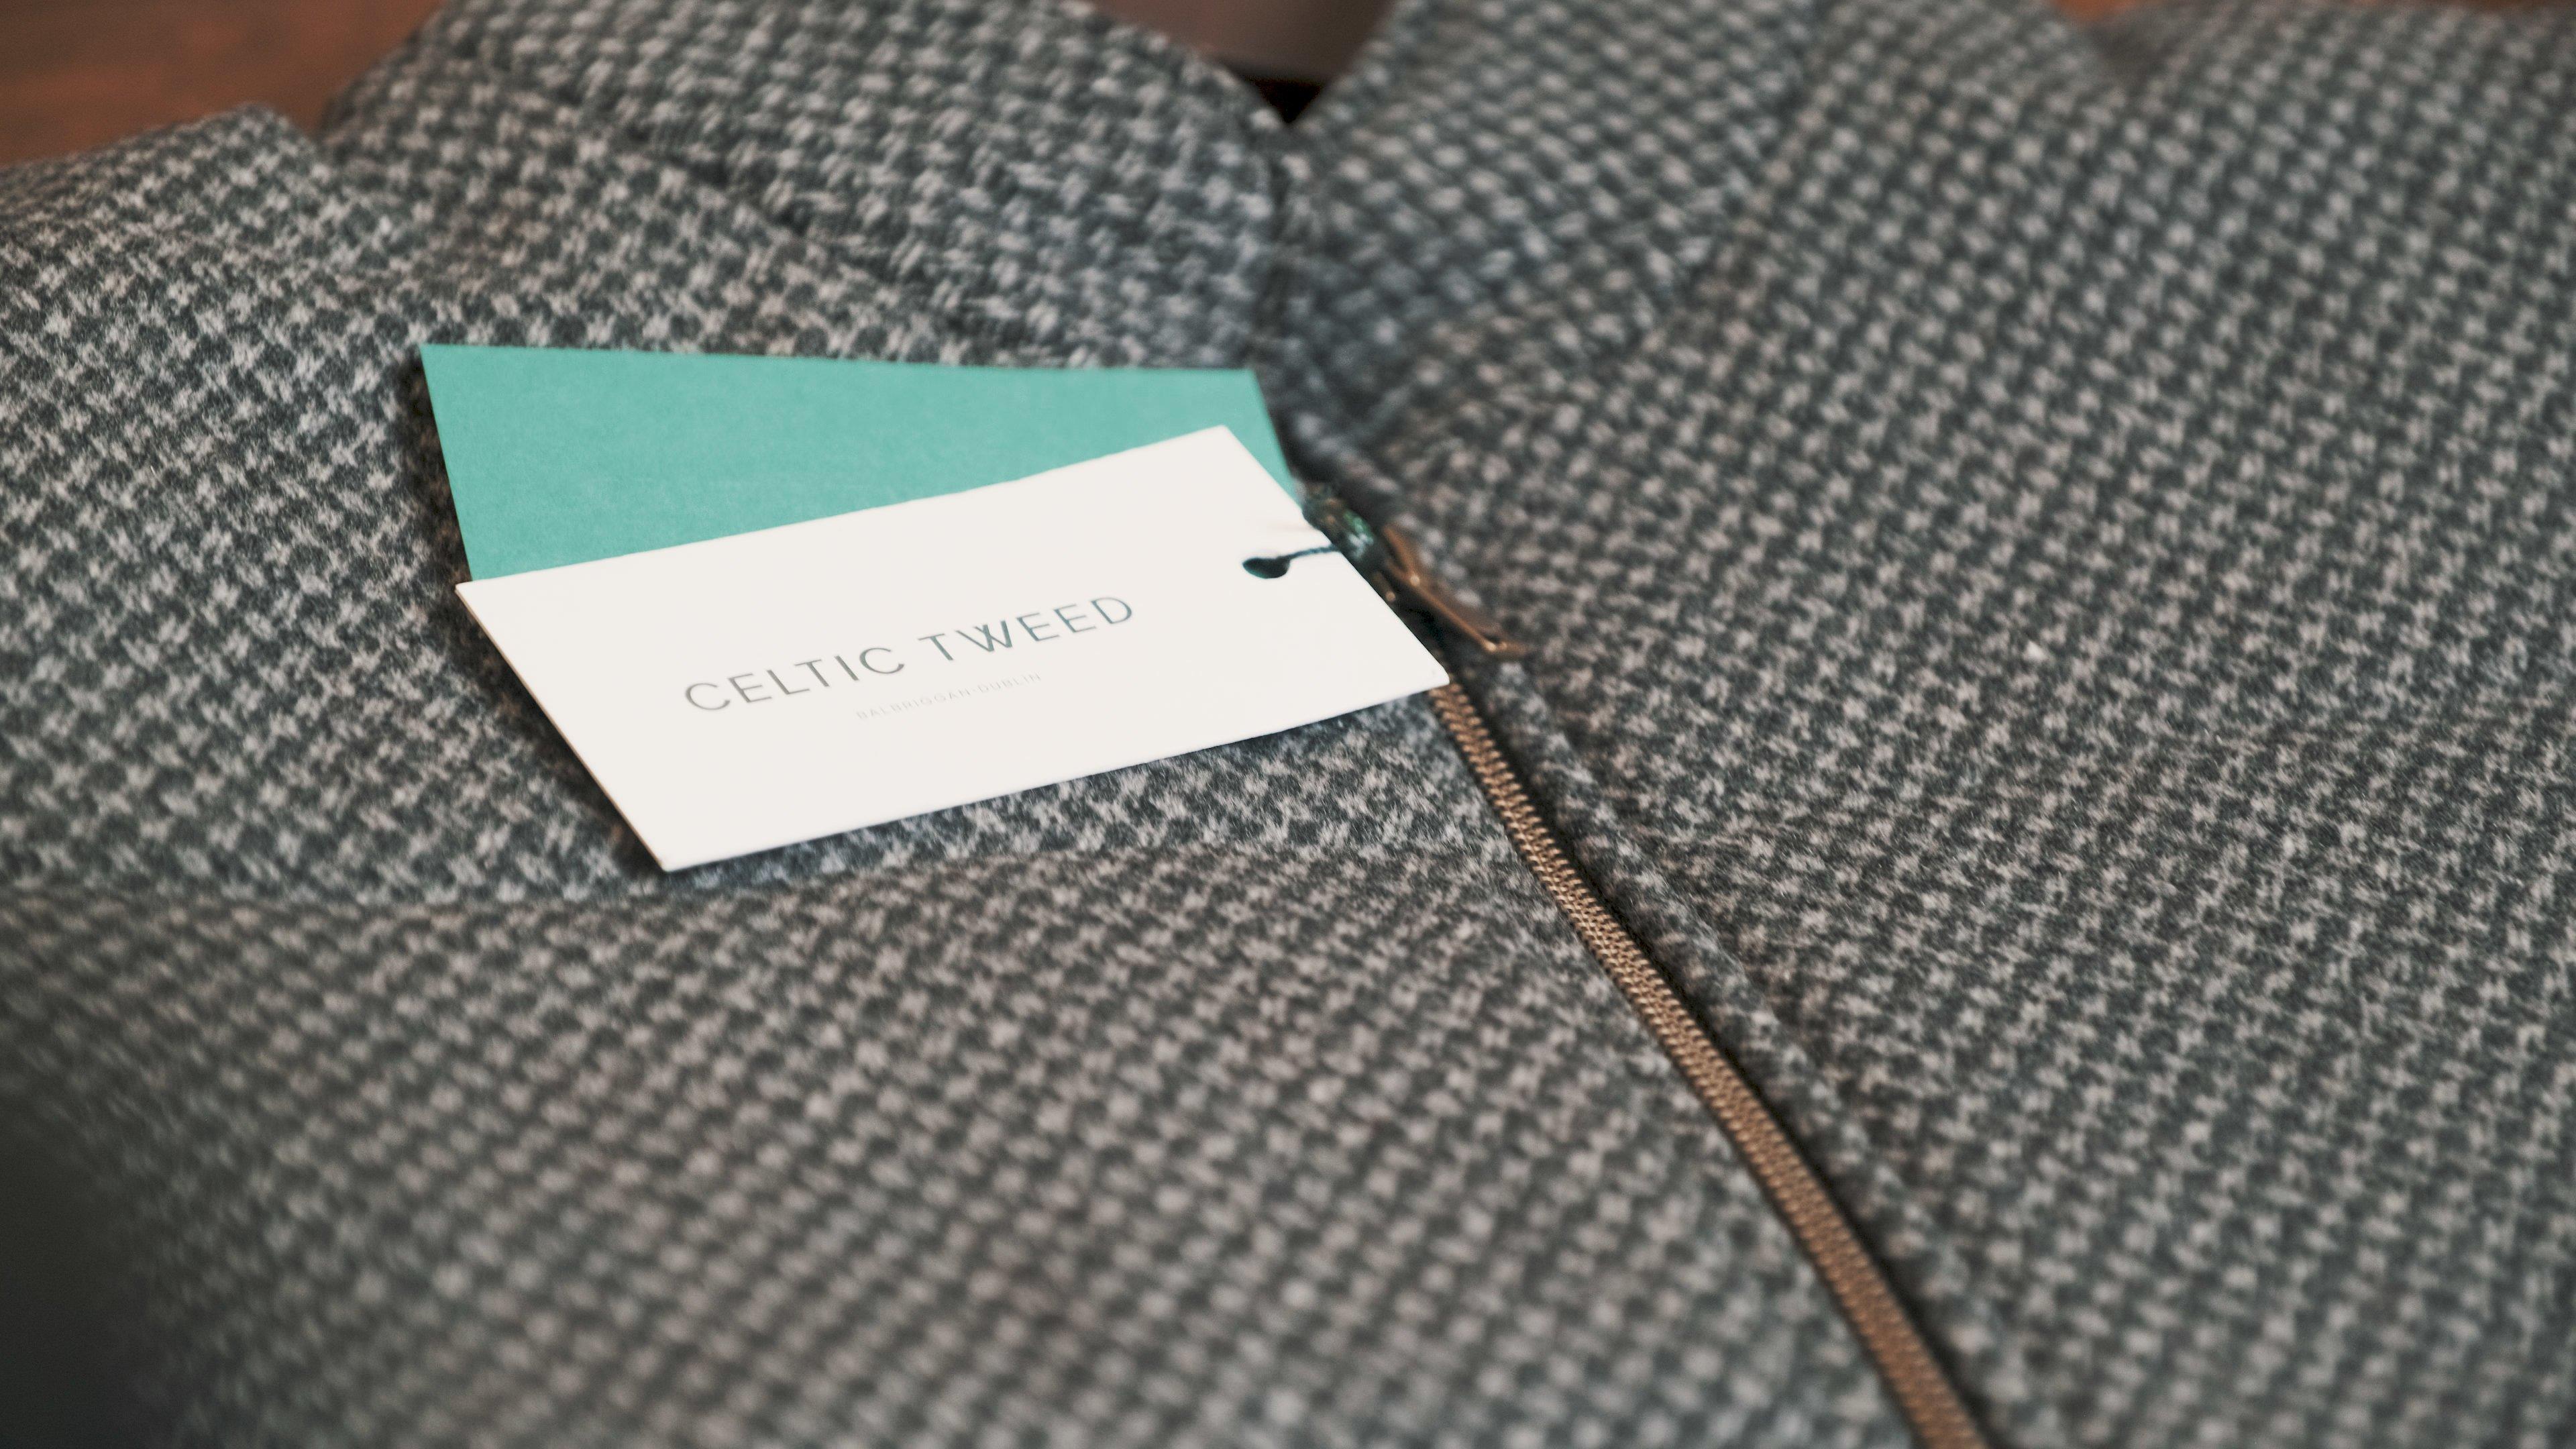 Who is Celtic Tweed?